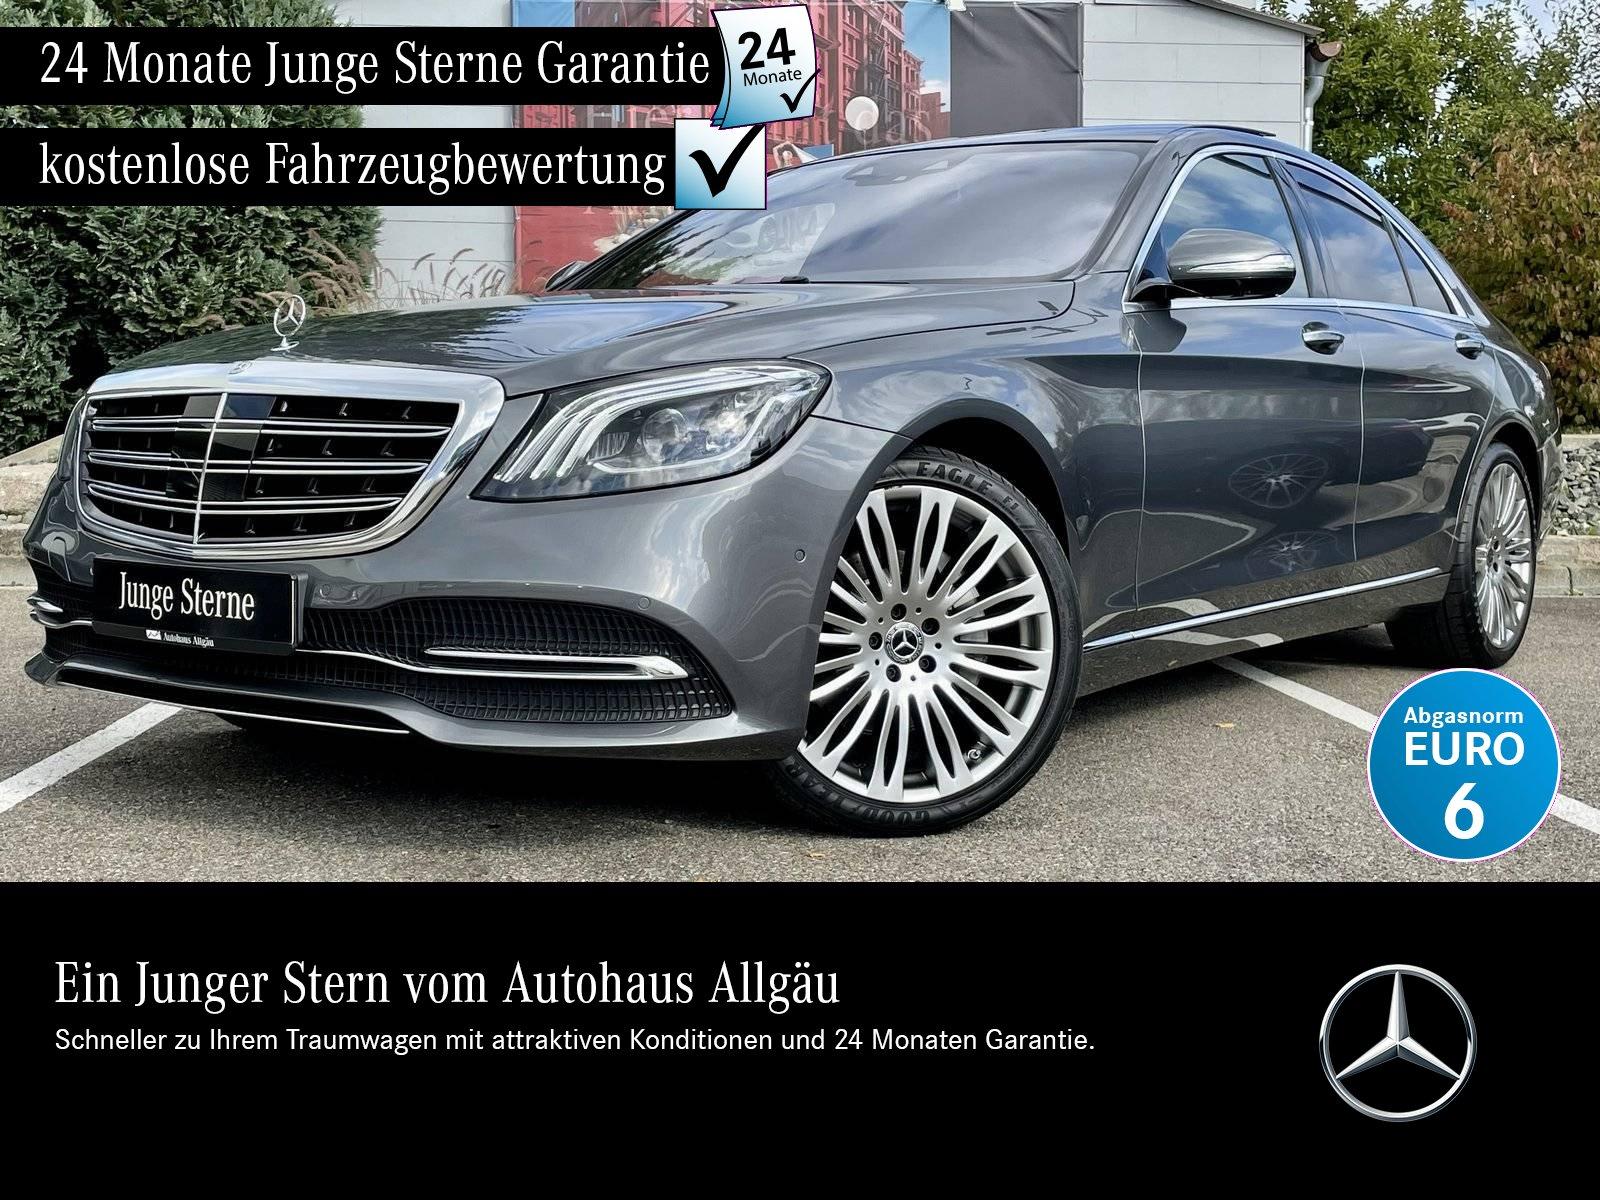 Mercedes-Benz S 350 d 4M SITZKLIMA+HEAD-UP+PANO+BURMESTER+360°, Jahr 2018, Diesel